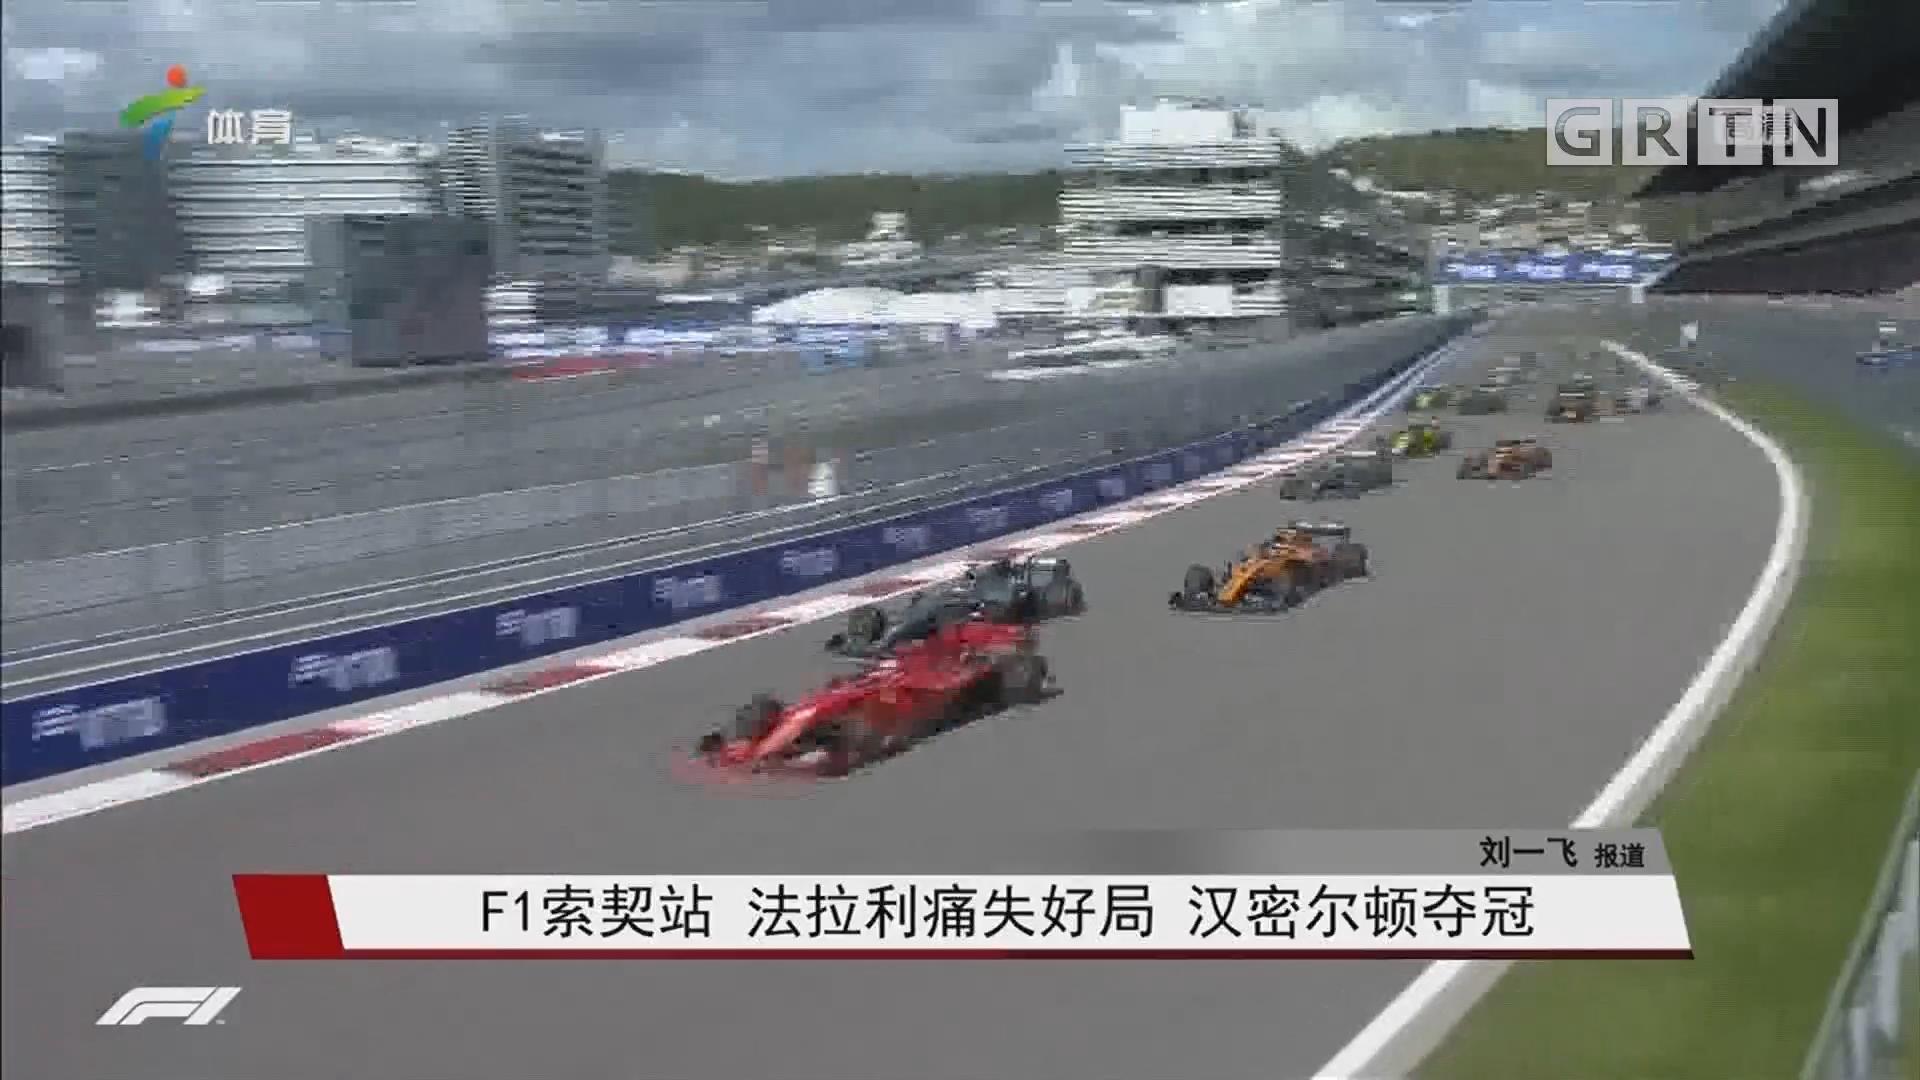 F1索契站 法拉利痛失好局 汉密尔顿夺冠